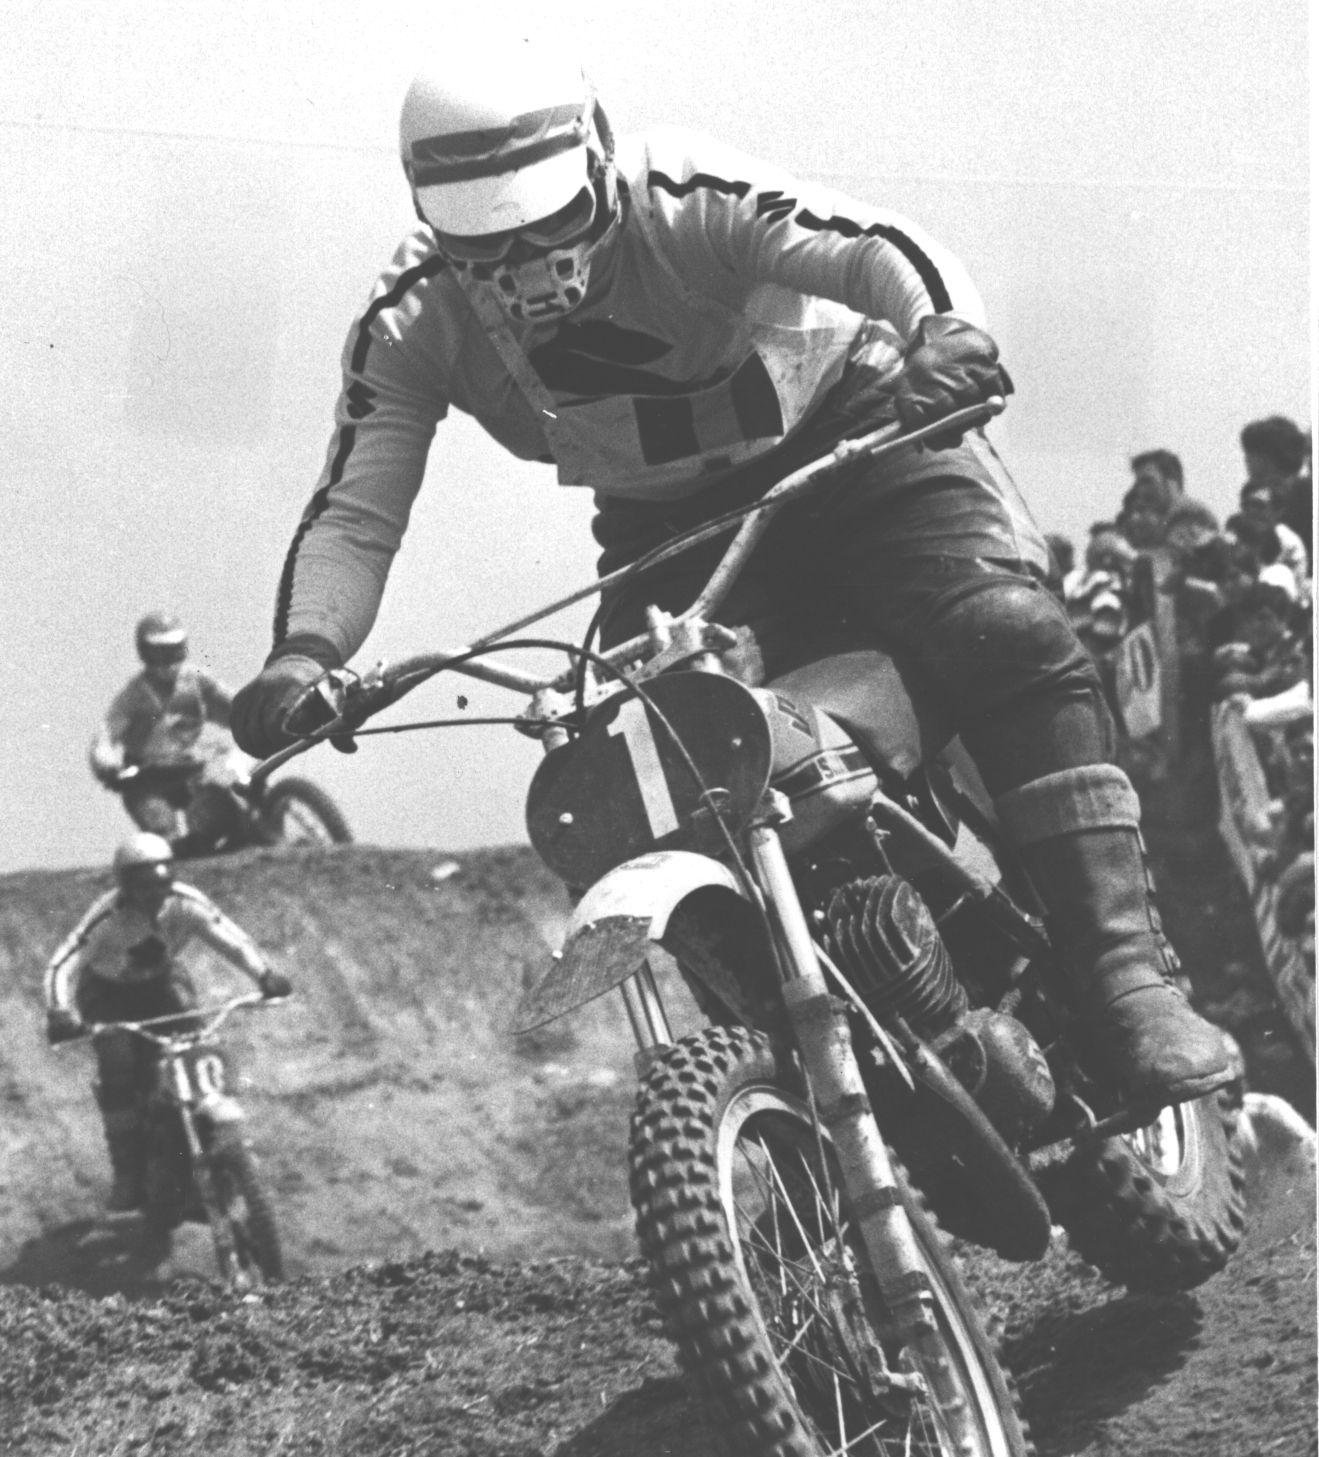 200013-1970-Motocross GP 250-Joël Robert (BEL)-Suzuki.jpg